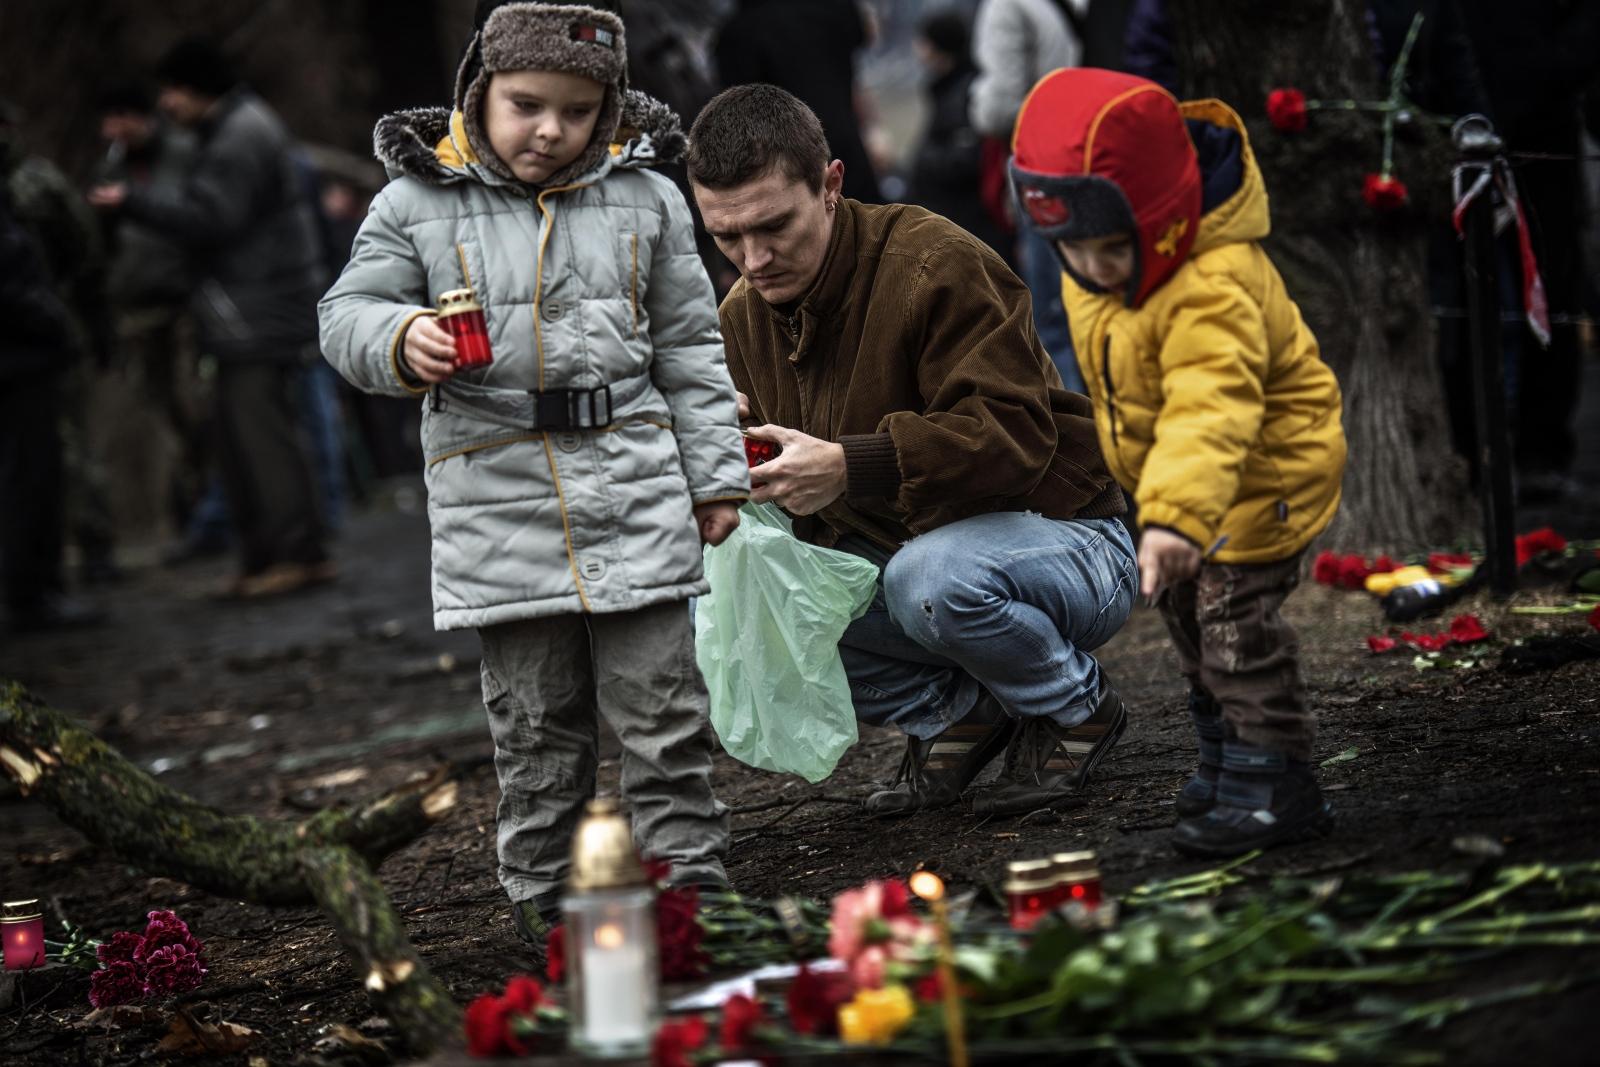 Art and Documentary Photography - Loading Behind_Kiev_s_barricades_43.jpg